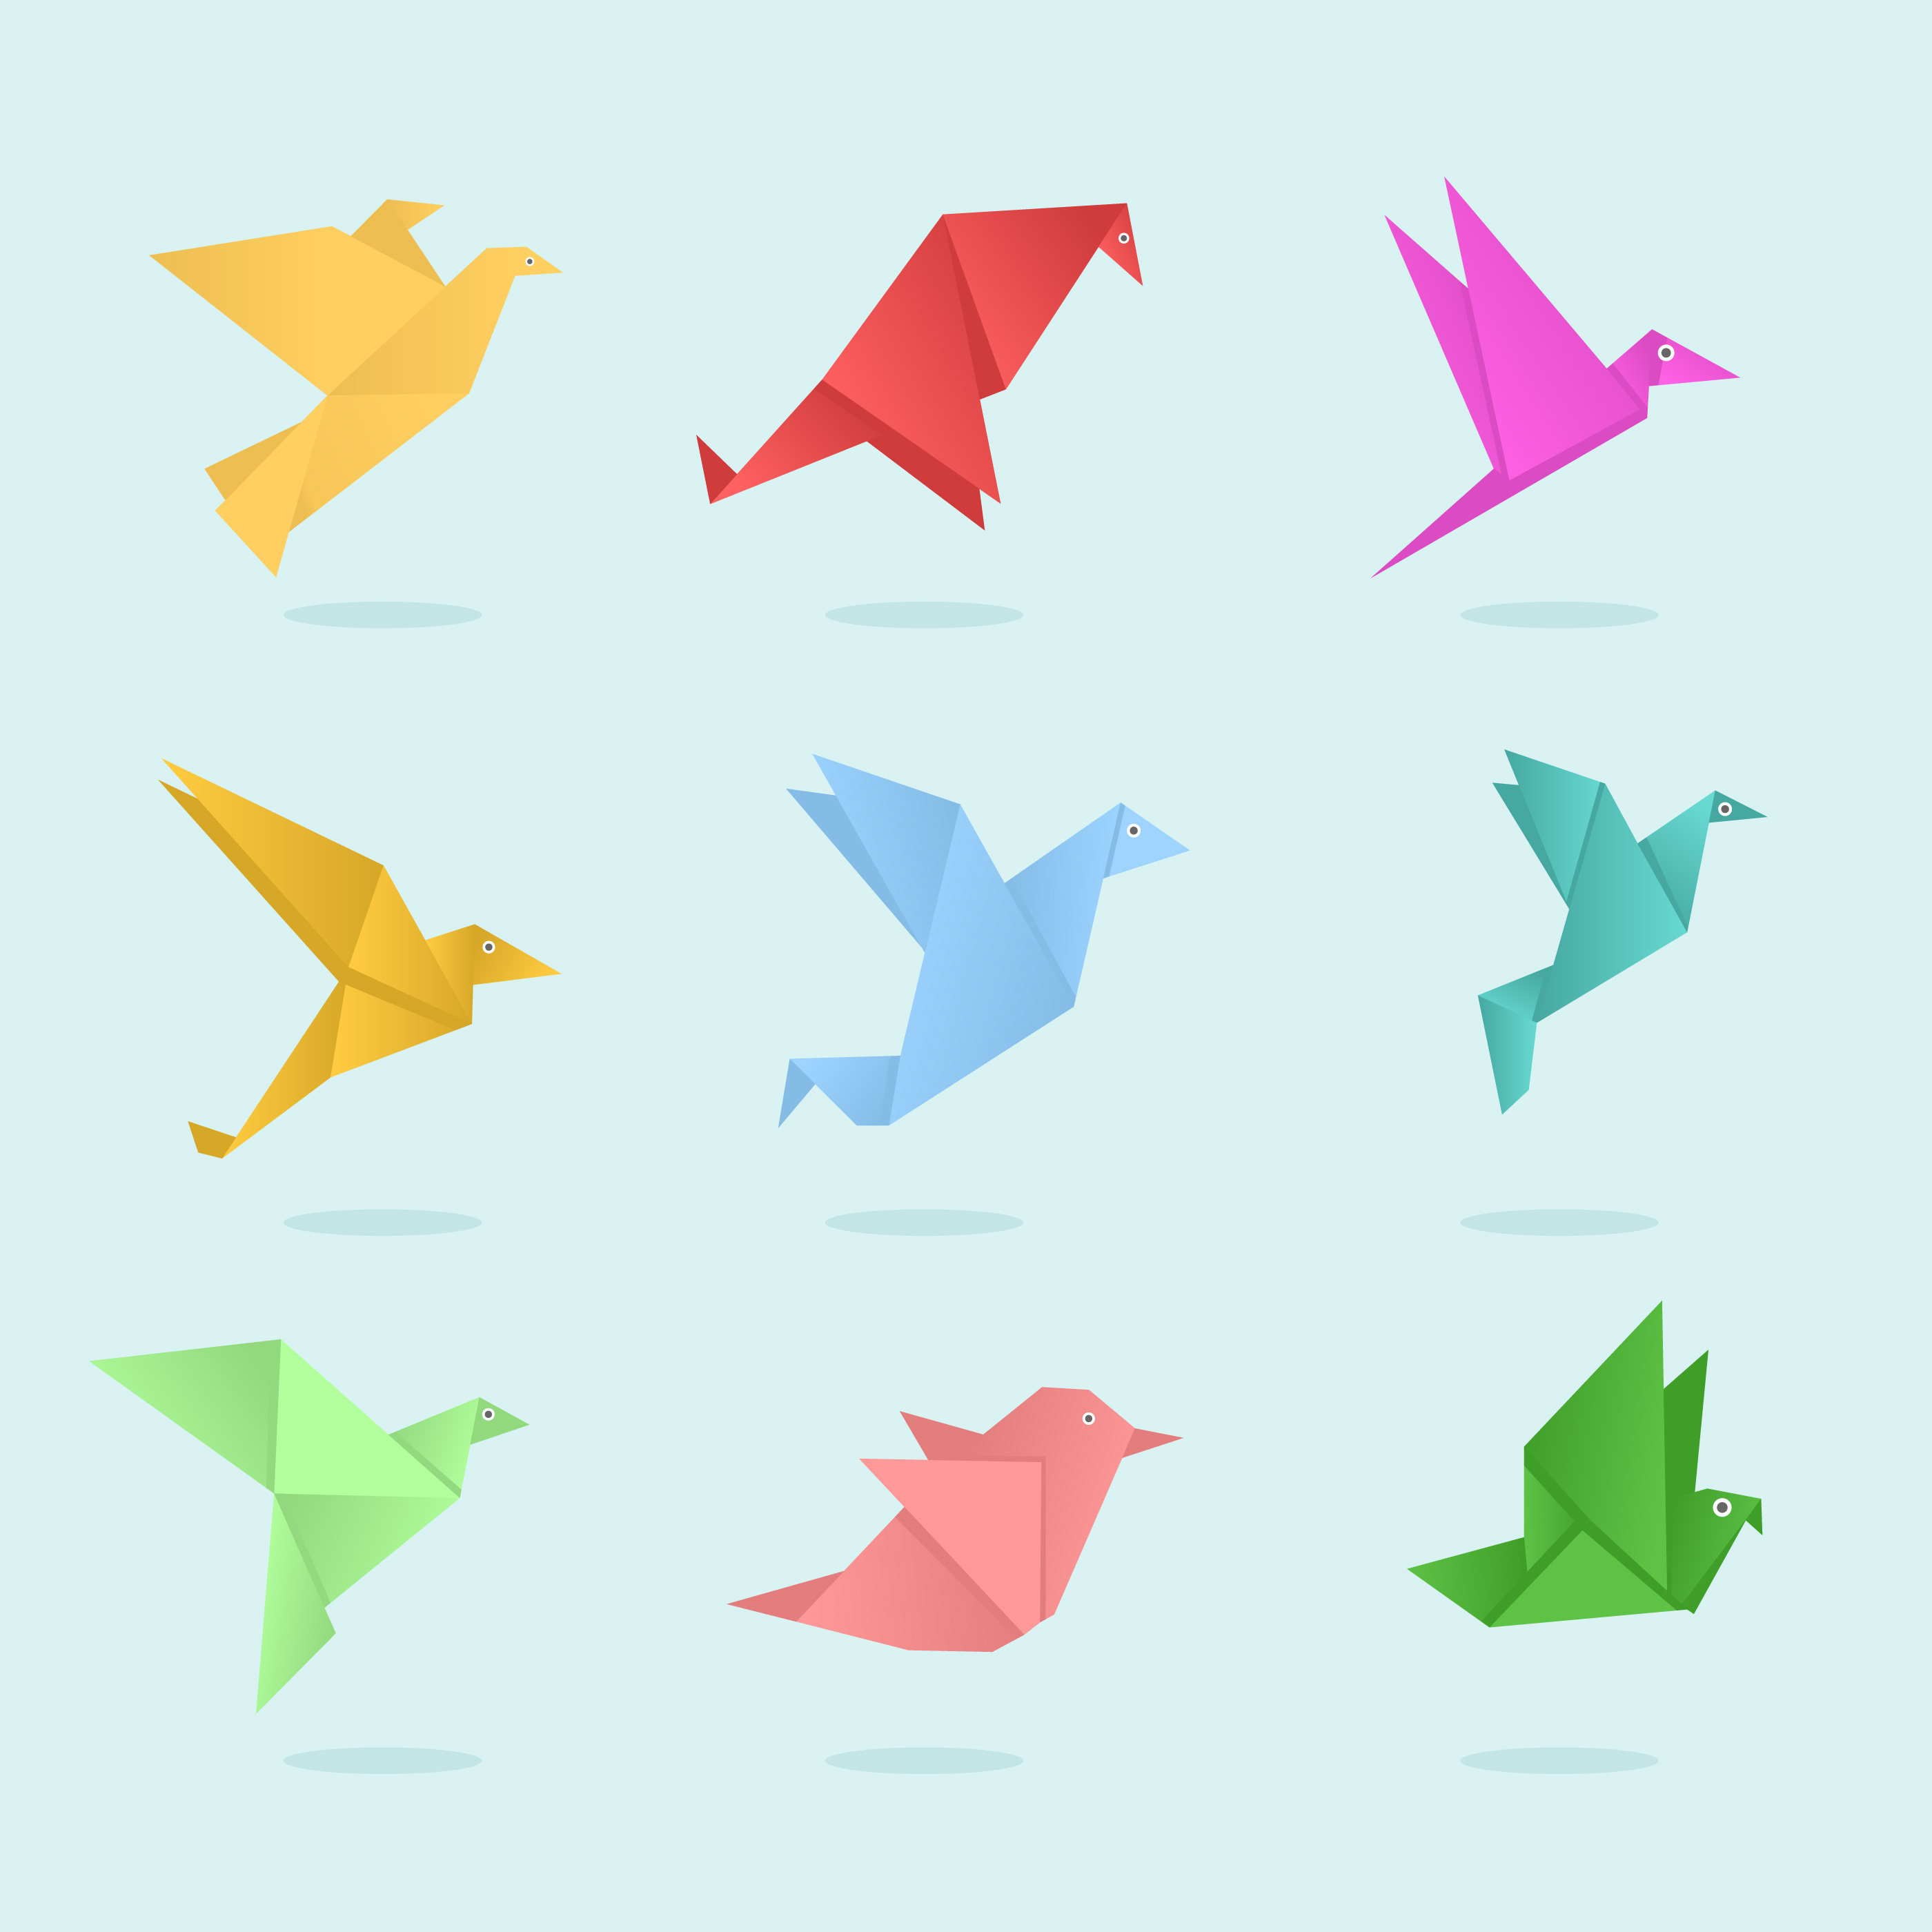 Origami Animals Vector - Download Free Vector Art, Stock ... - photo#14